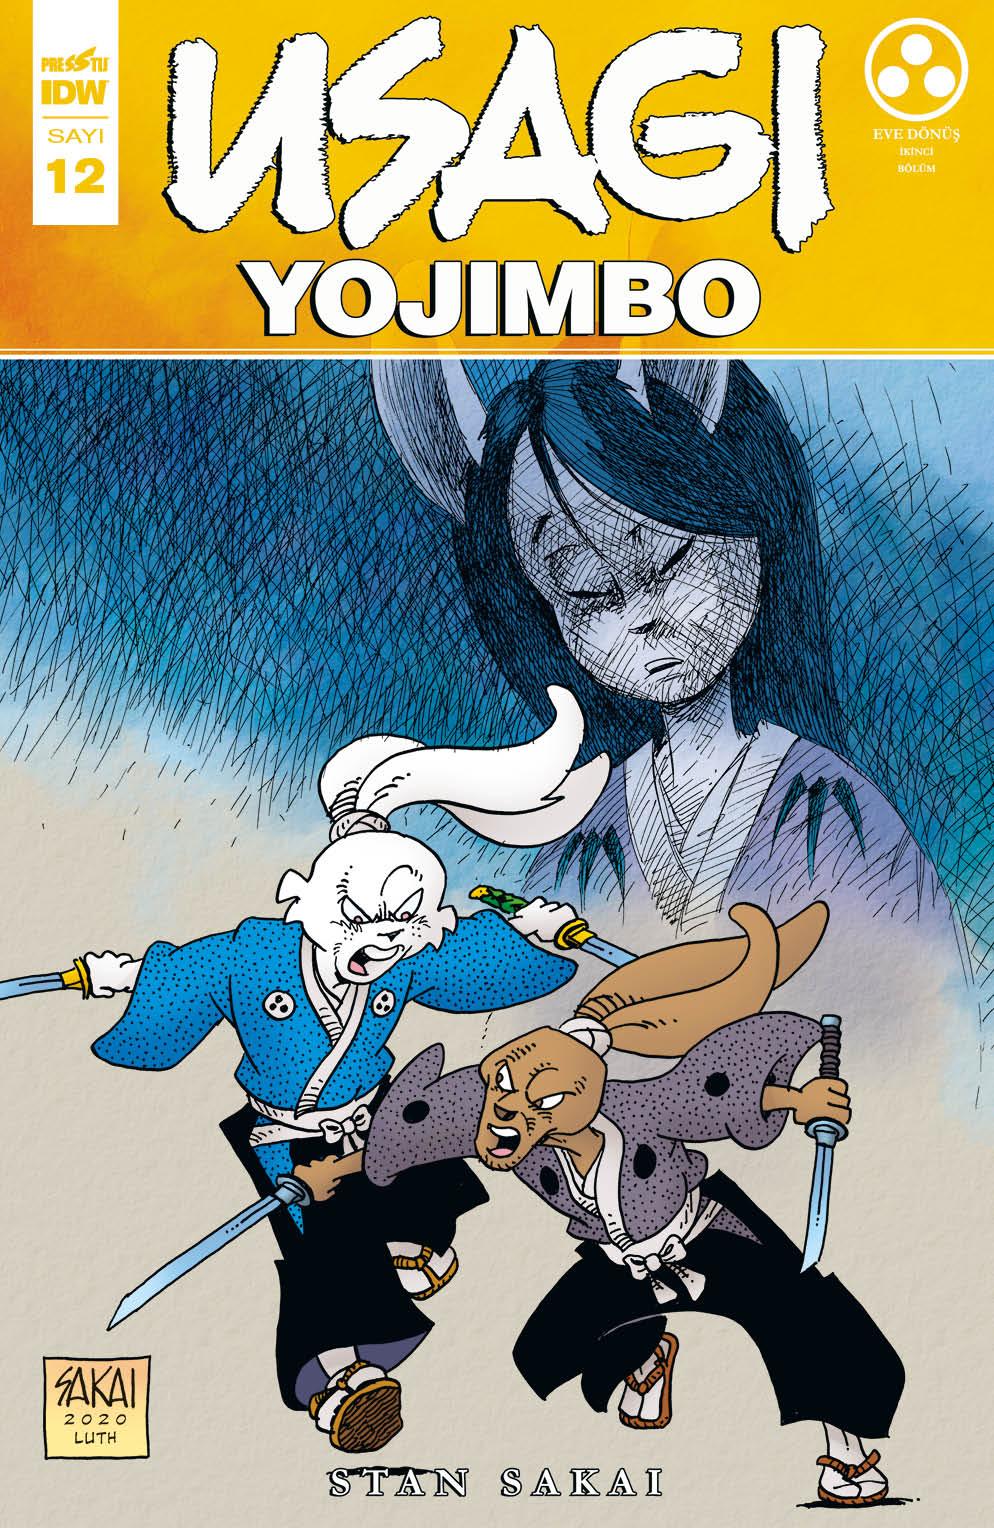 Usagi Yojimbo Sayı 12